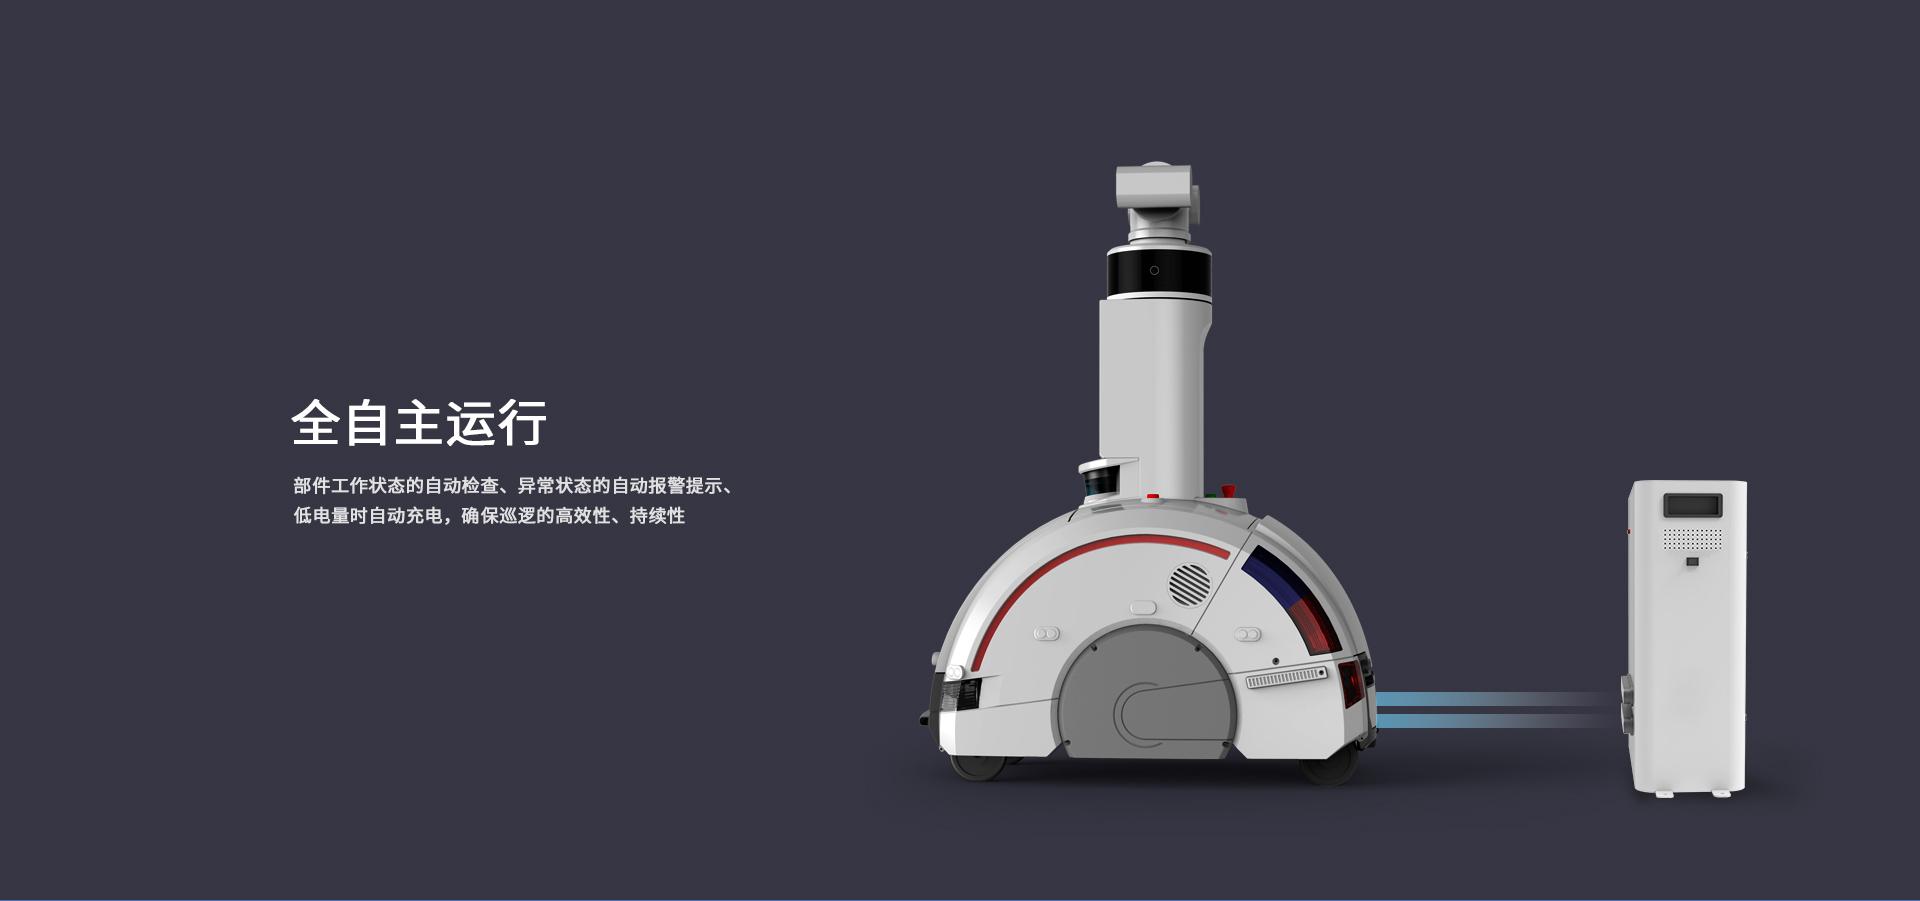 巡逻机器人AN-D